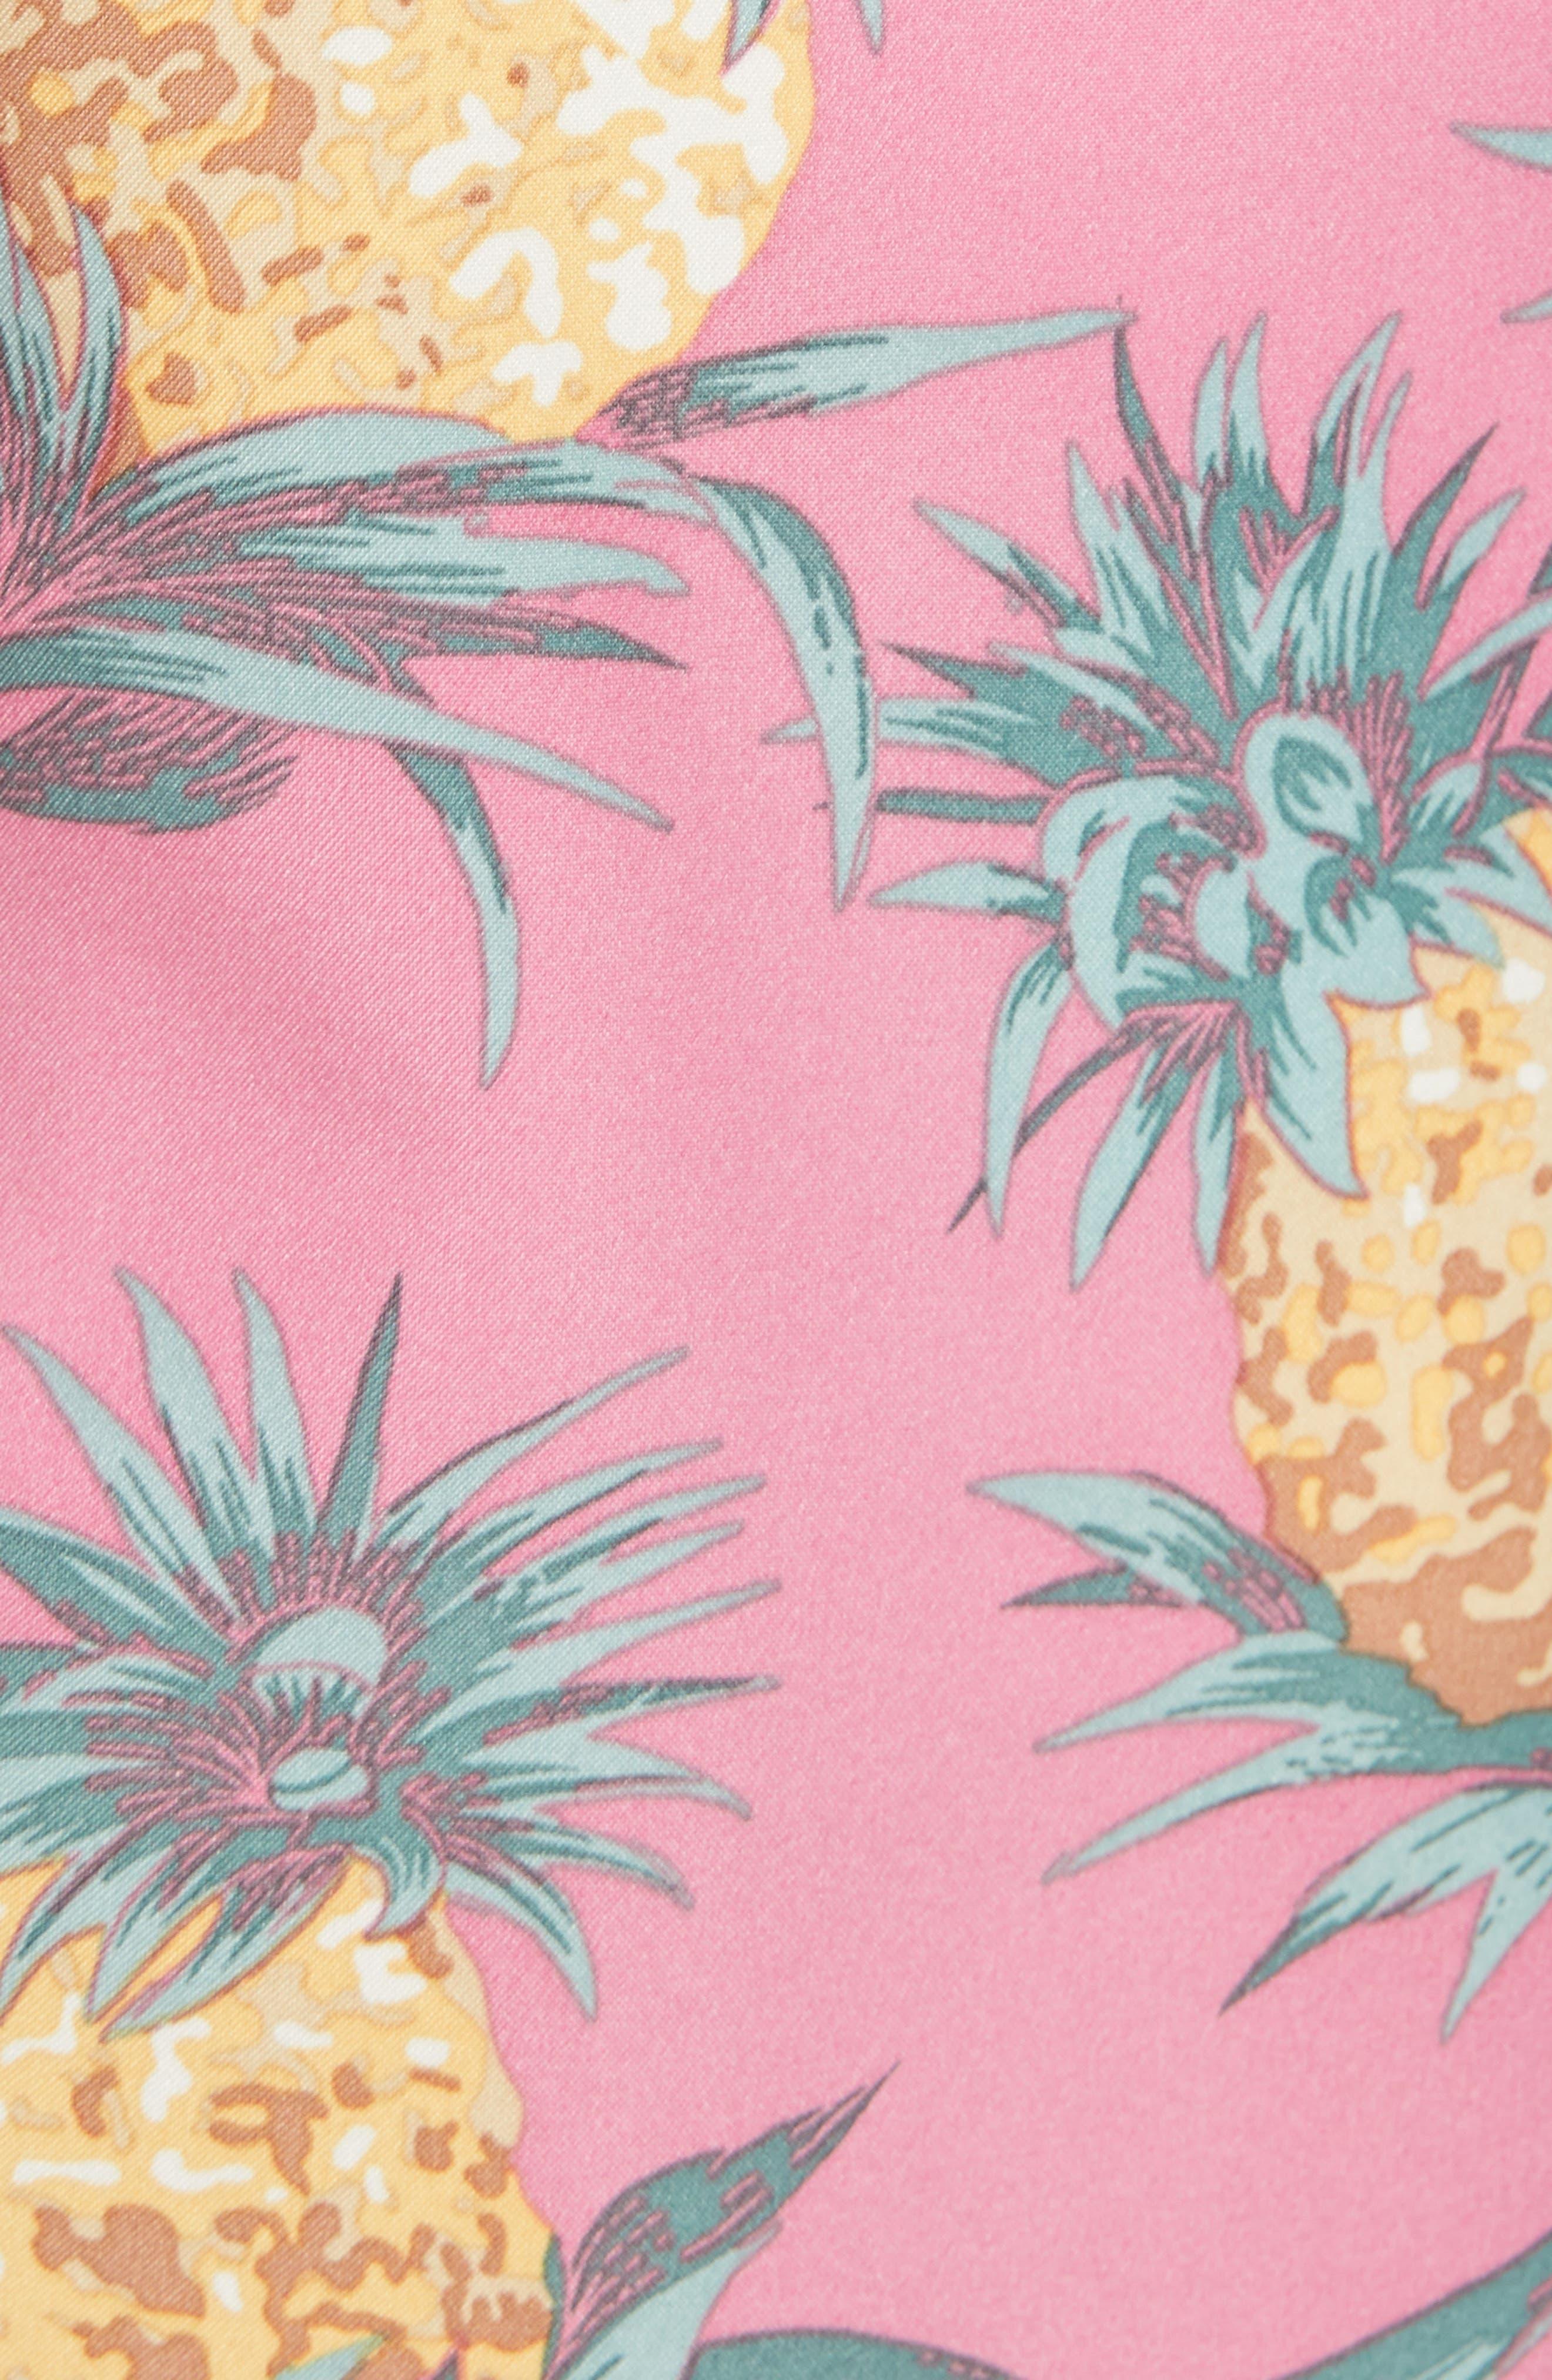 Banzai 9-Inch Swim Trunks,                             Alternate thumbnail 5, color,                             Pineapples Print